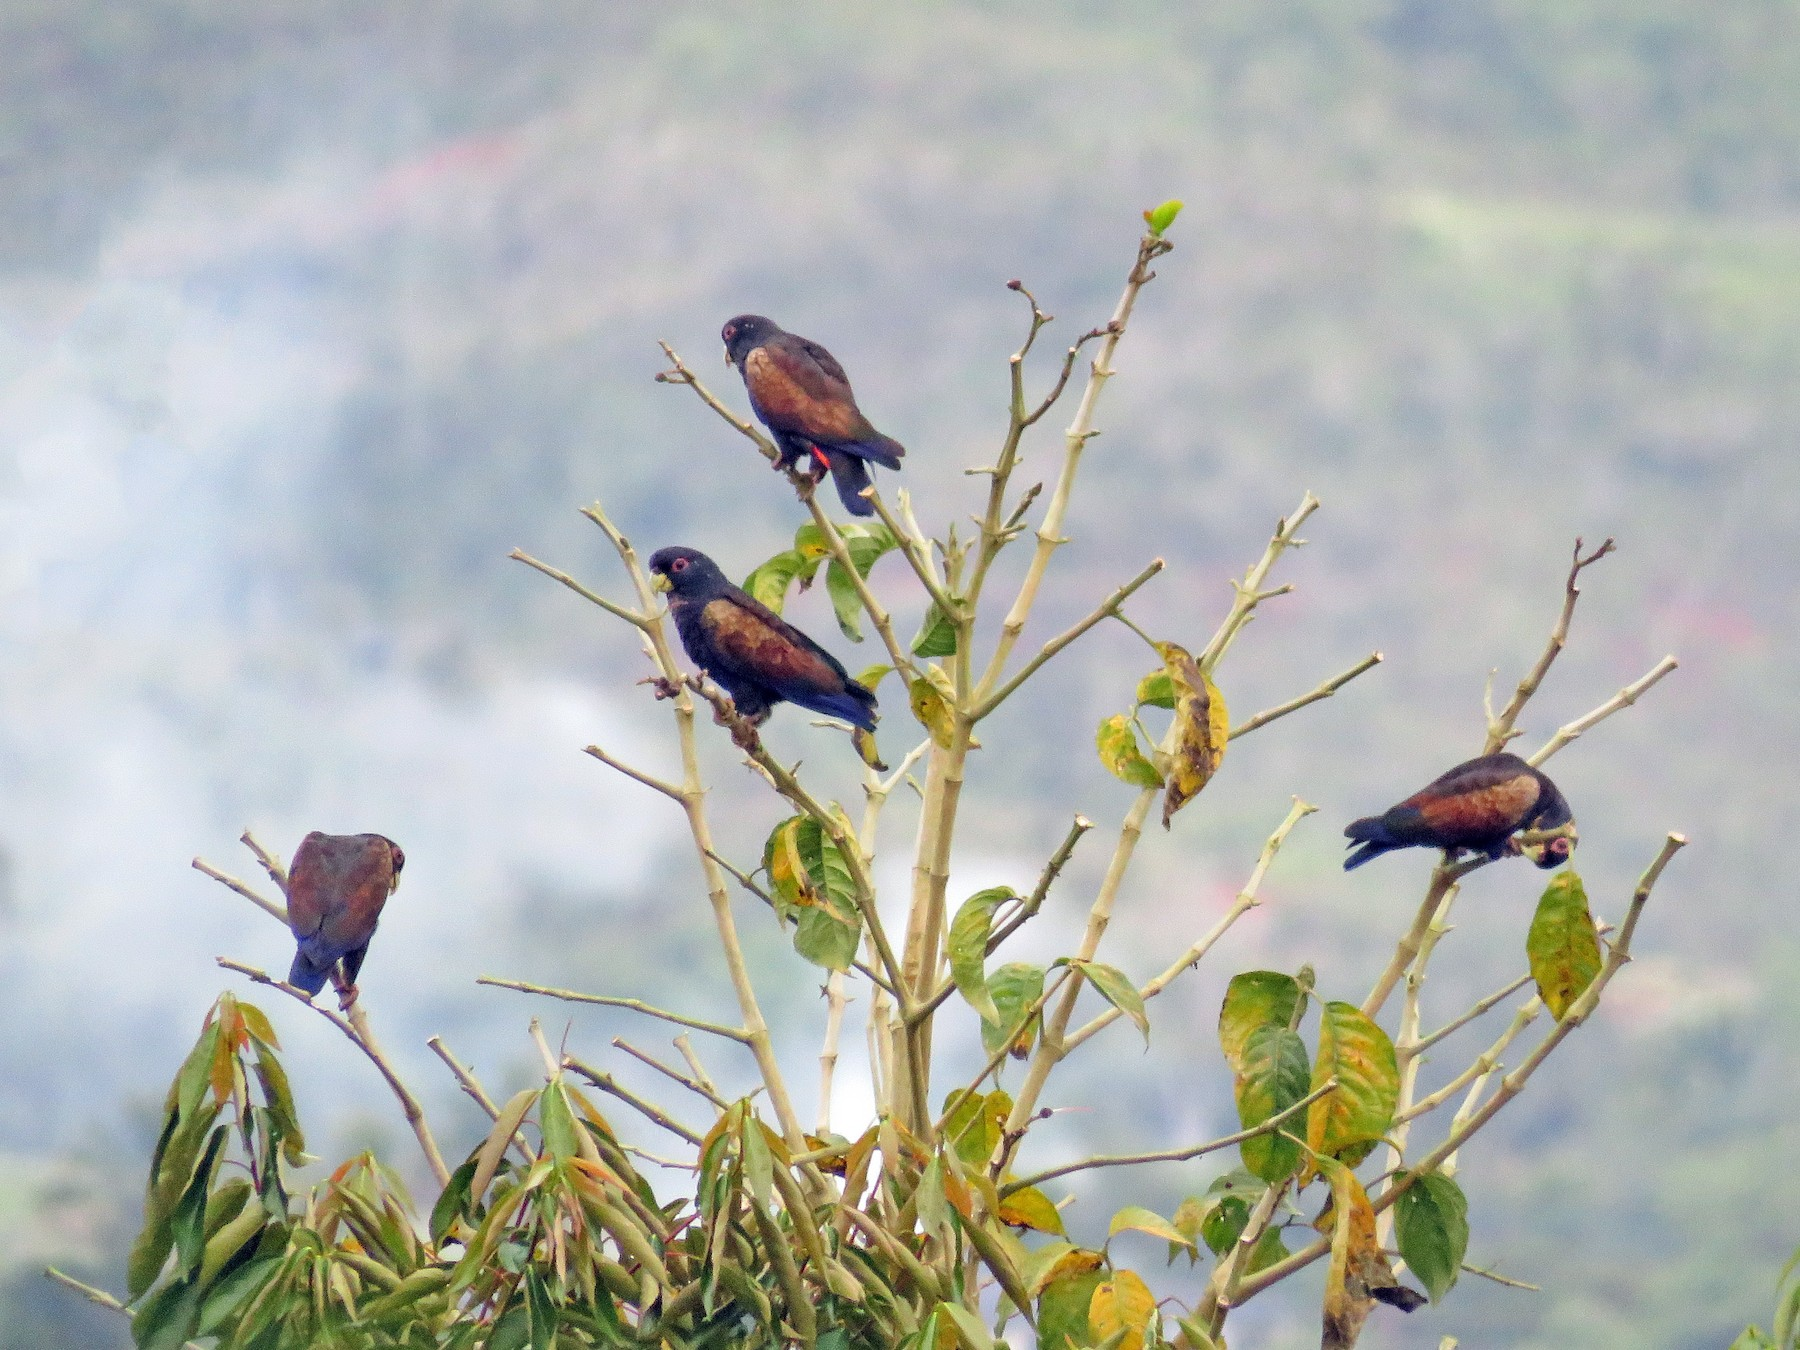 Bronze-winged Parrot - Juan Pablo Arboleda